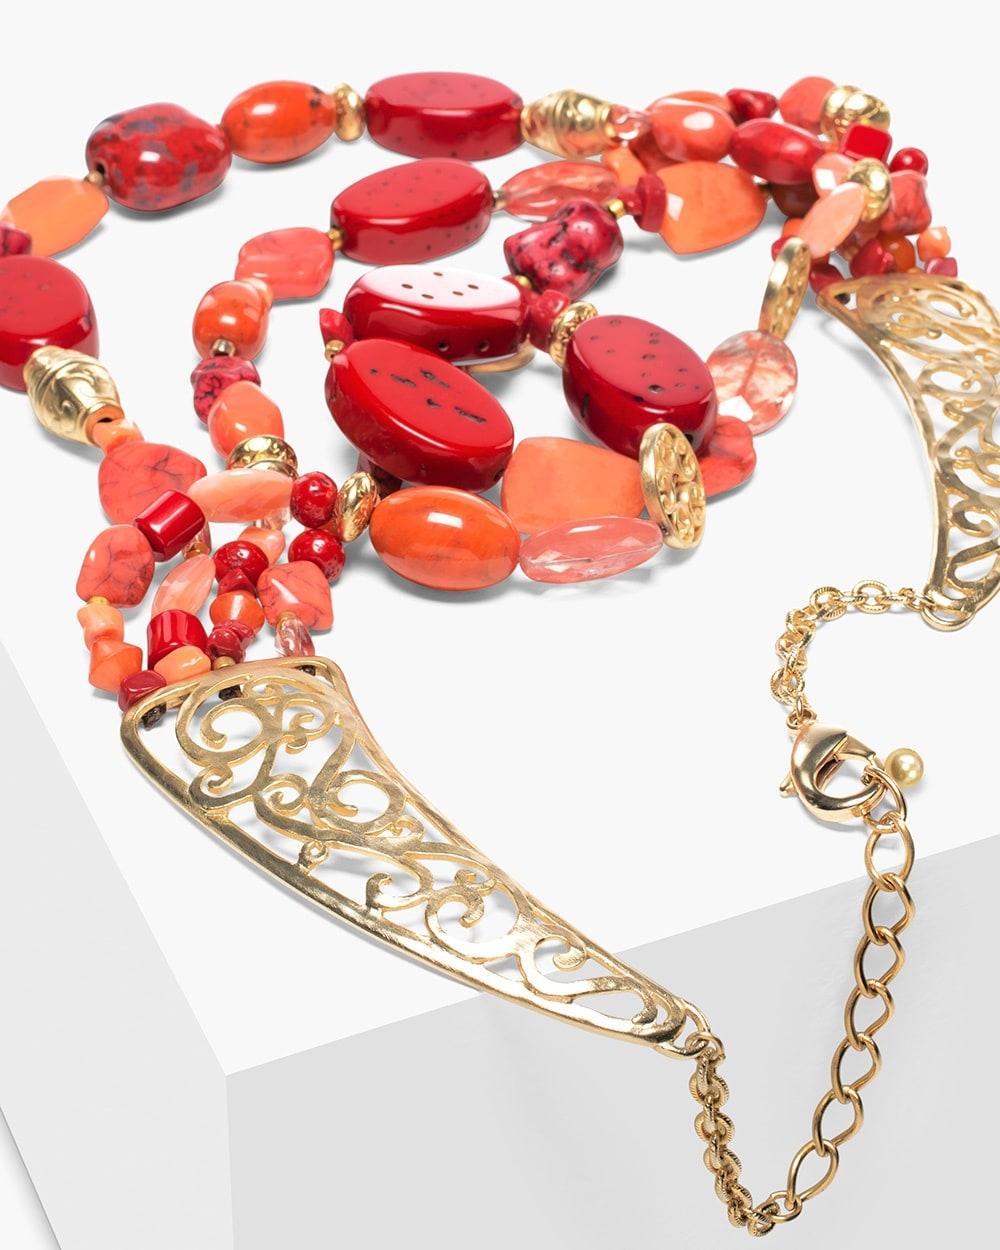 Coraline Necklace Chico S